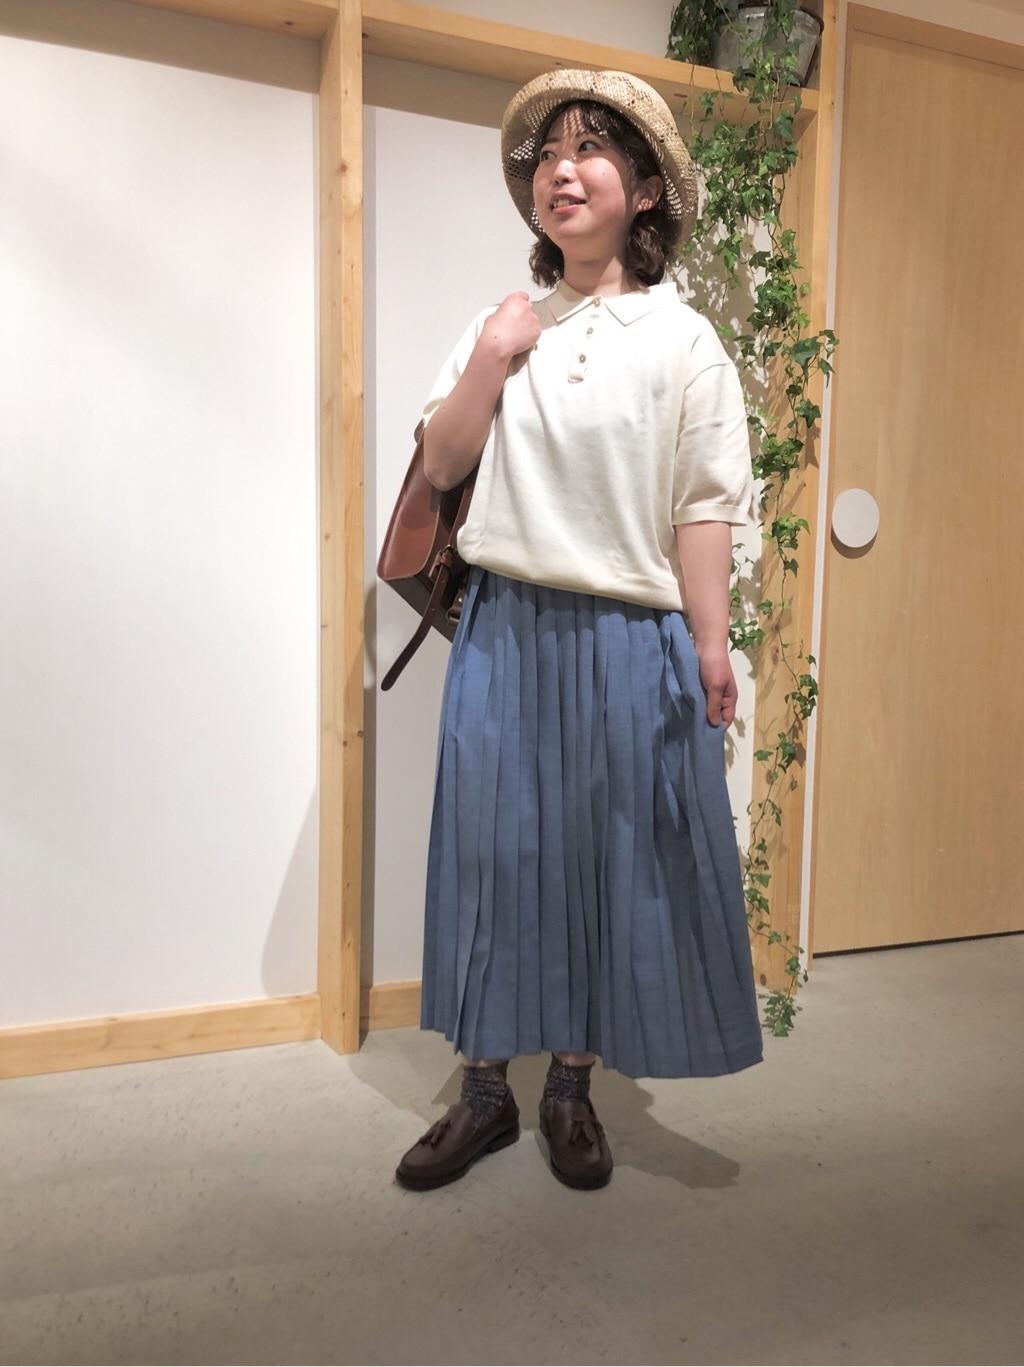 chambre de charme 京都路面 身長:150cm 2020.04.19